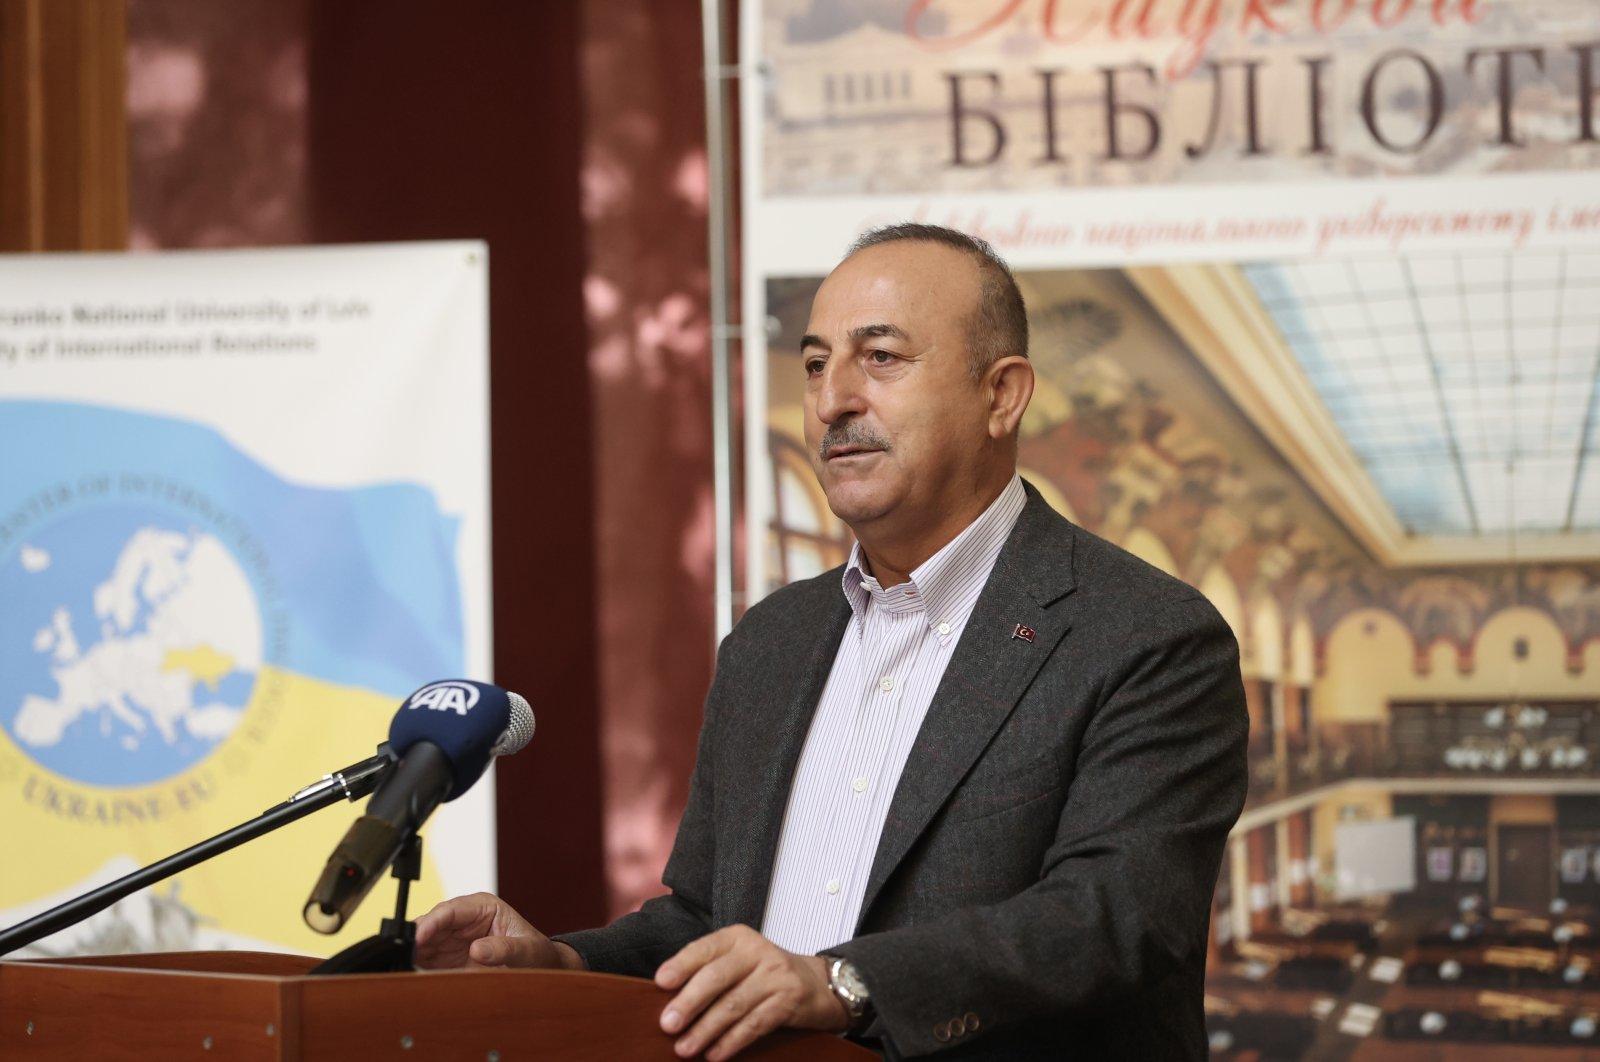 Foreign Minister Mevlüt Çavuşoğlu speaks at a panel hosted by Ivan Franko National University of Lviv in western Ukraine, Oct.8, 2021. (AA Photo)